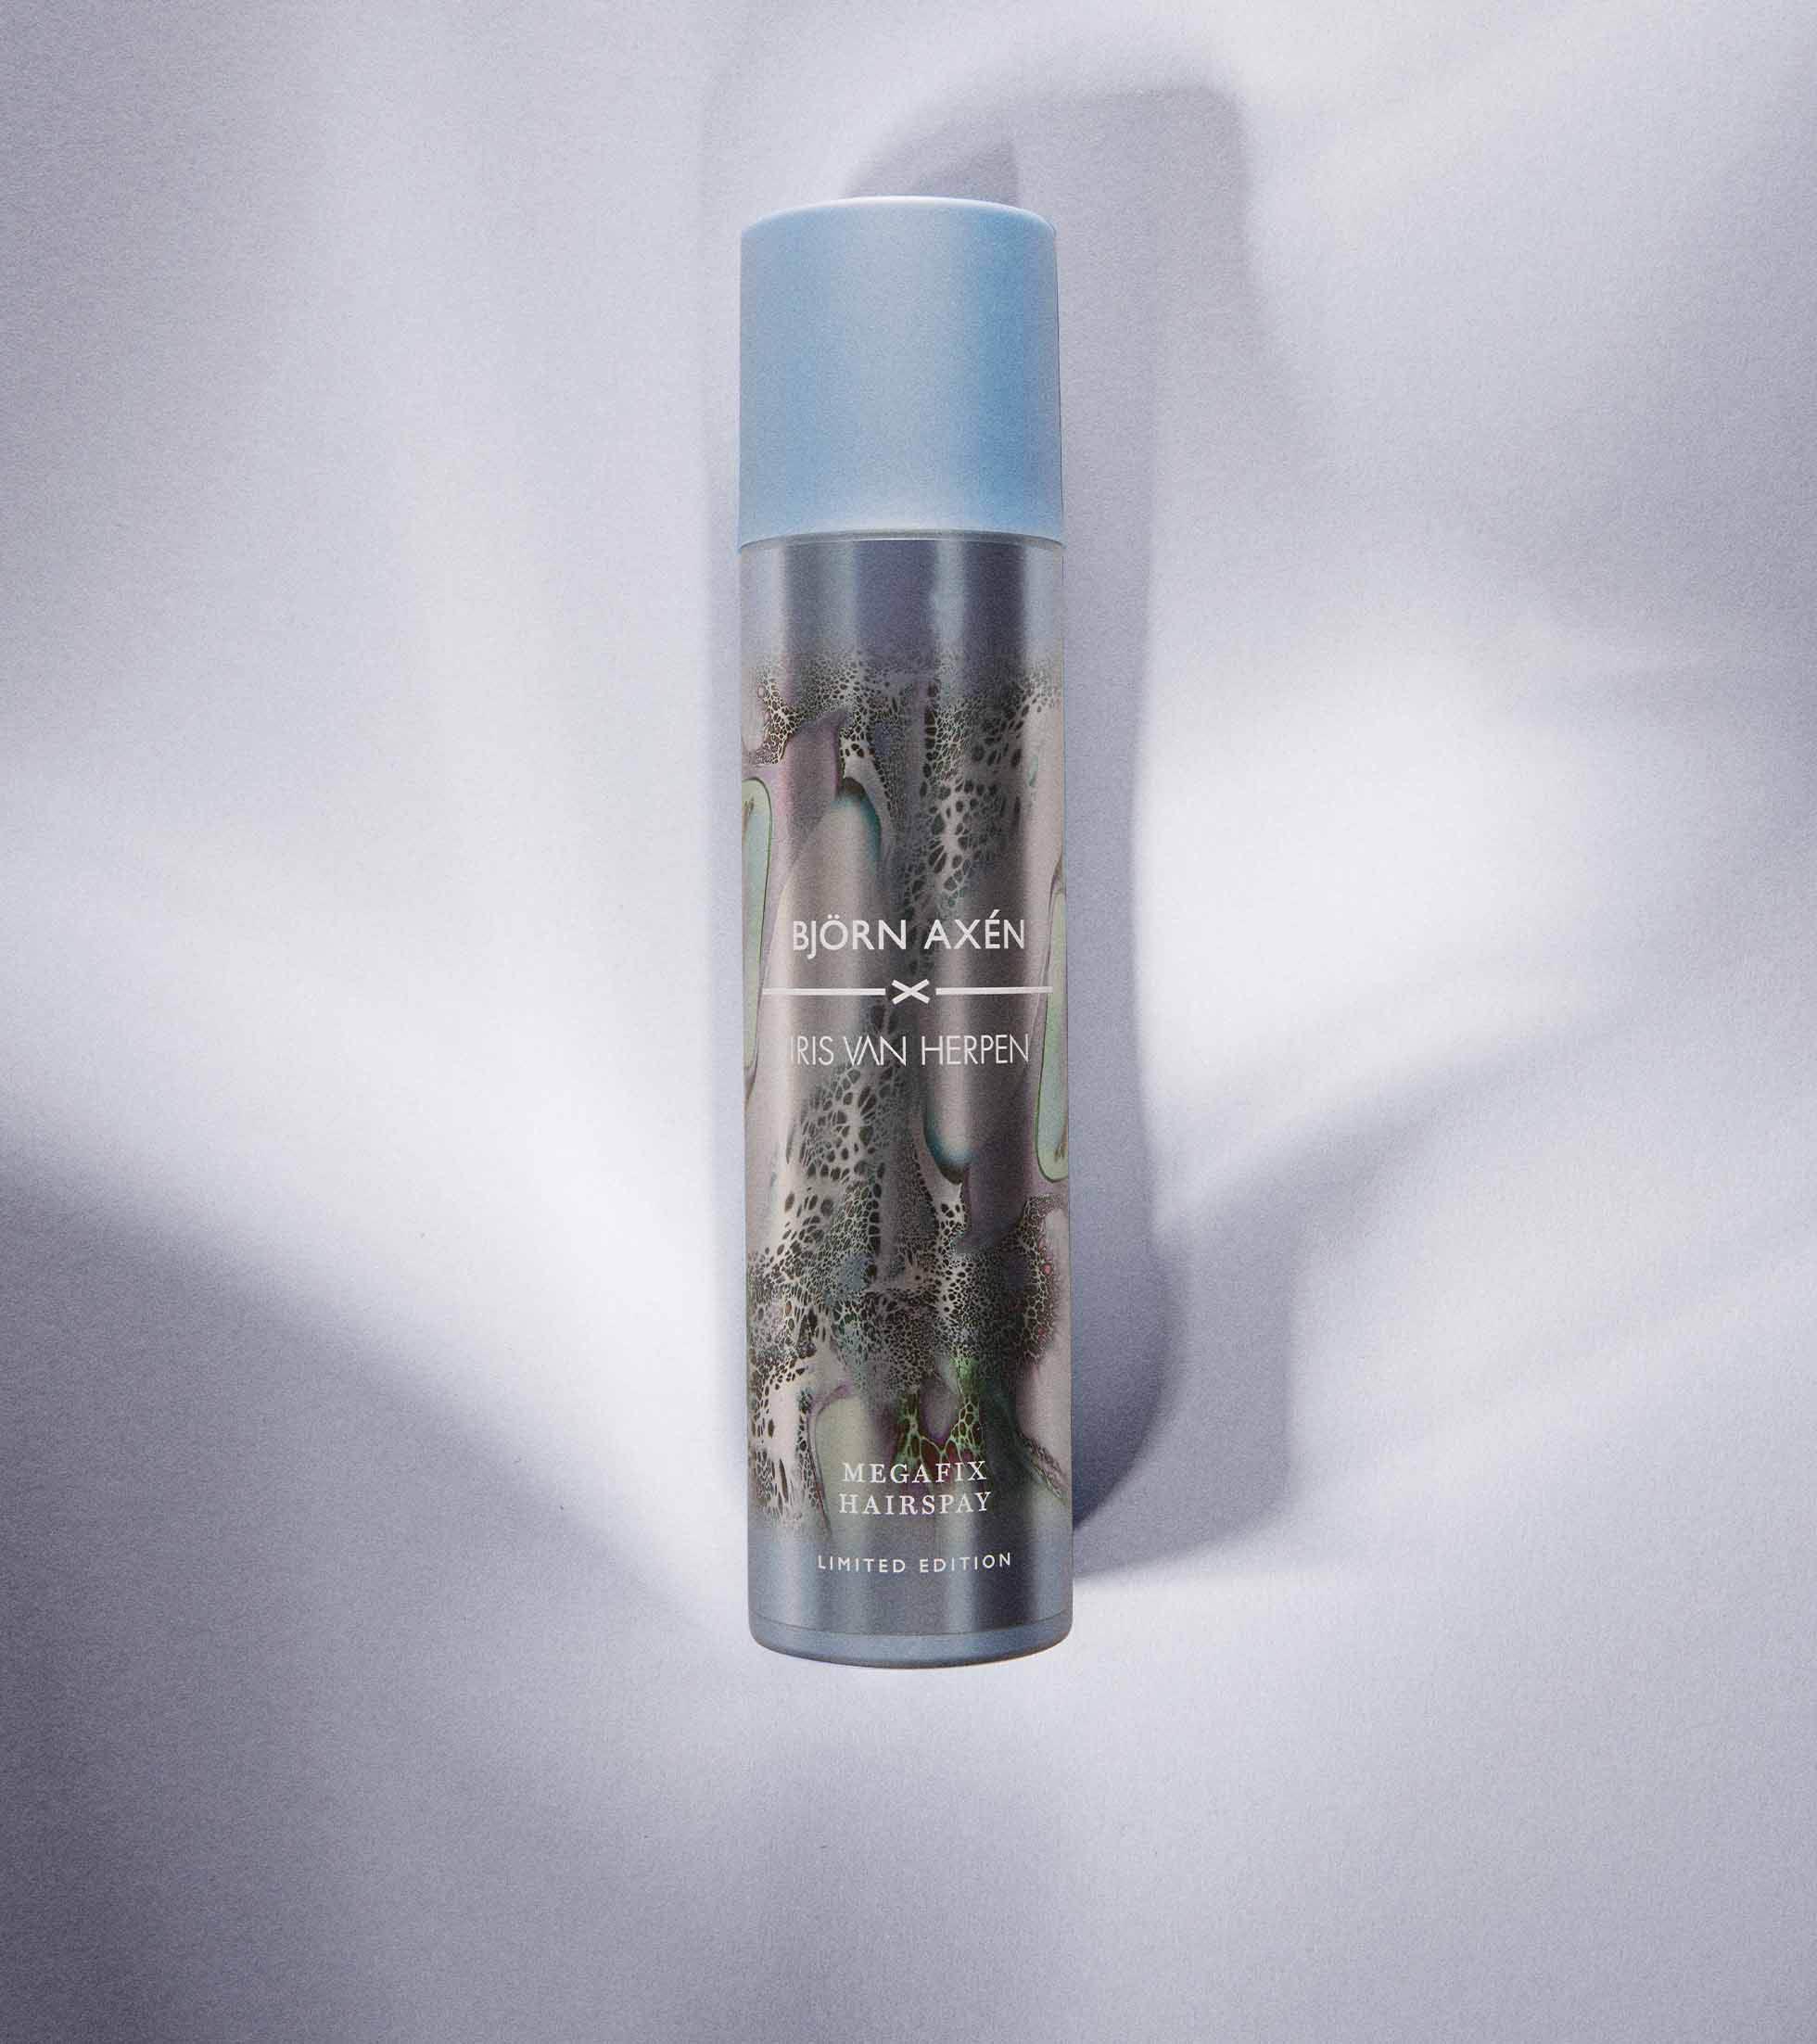 Megafix Hairspray Limited Edition Iris Van Herpen